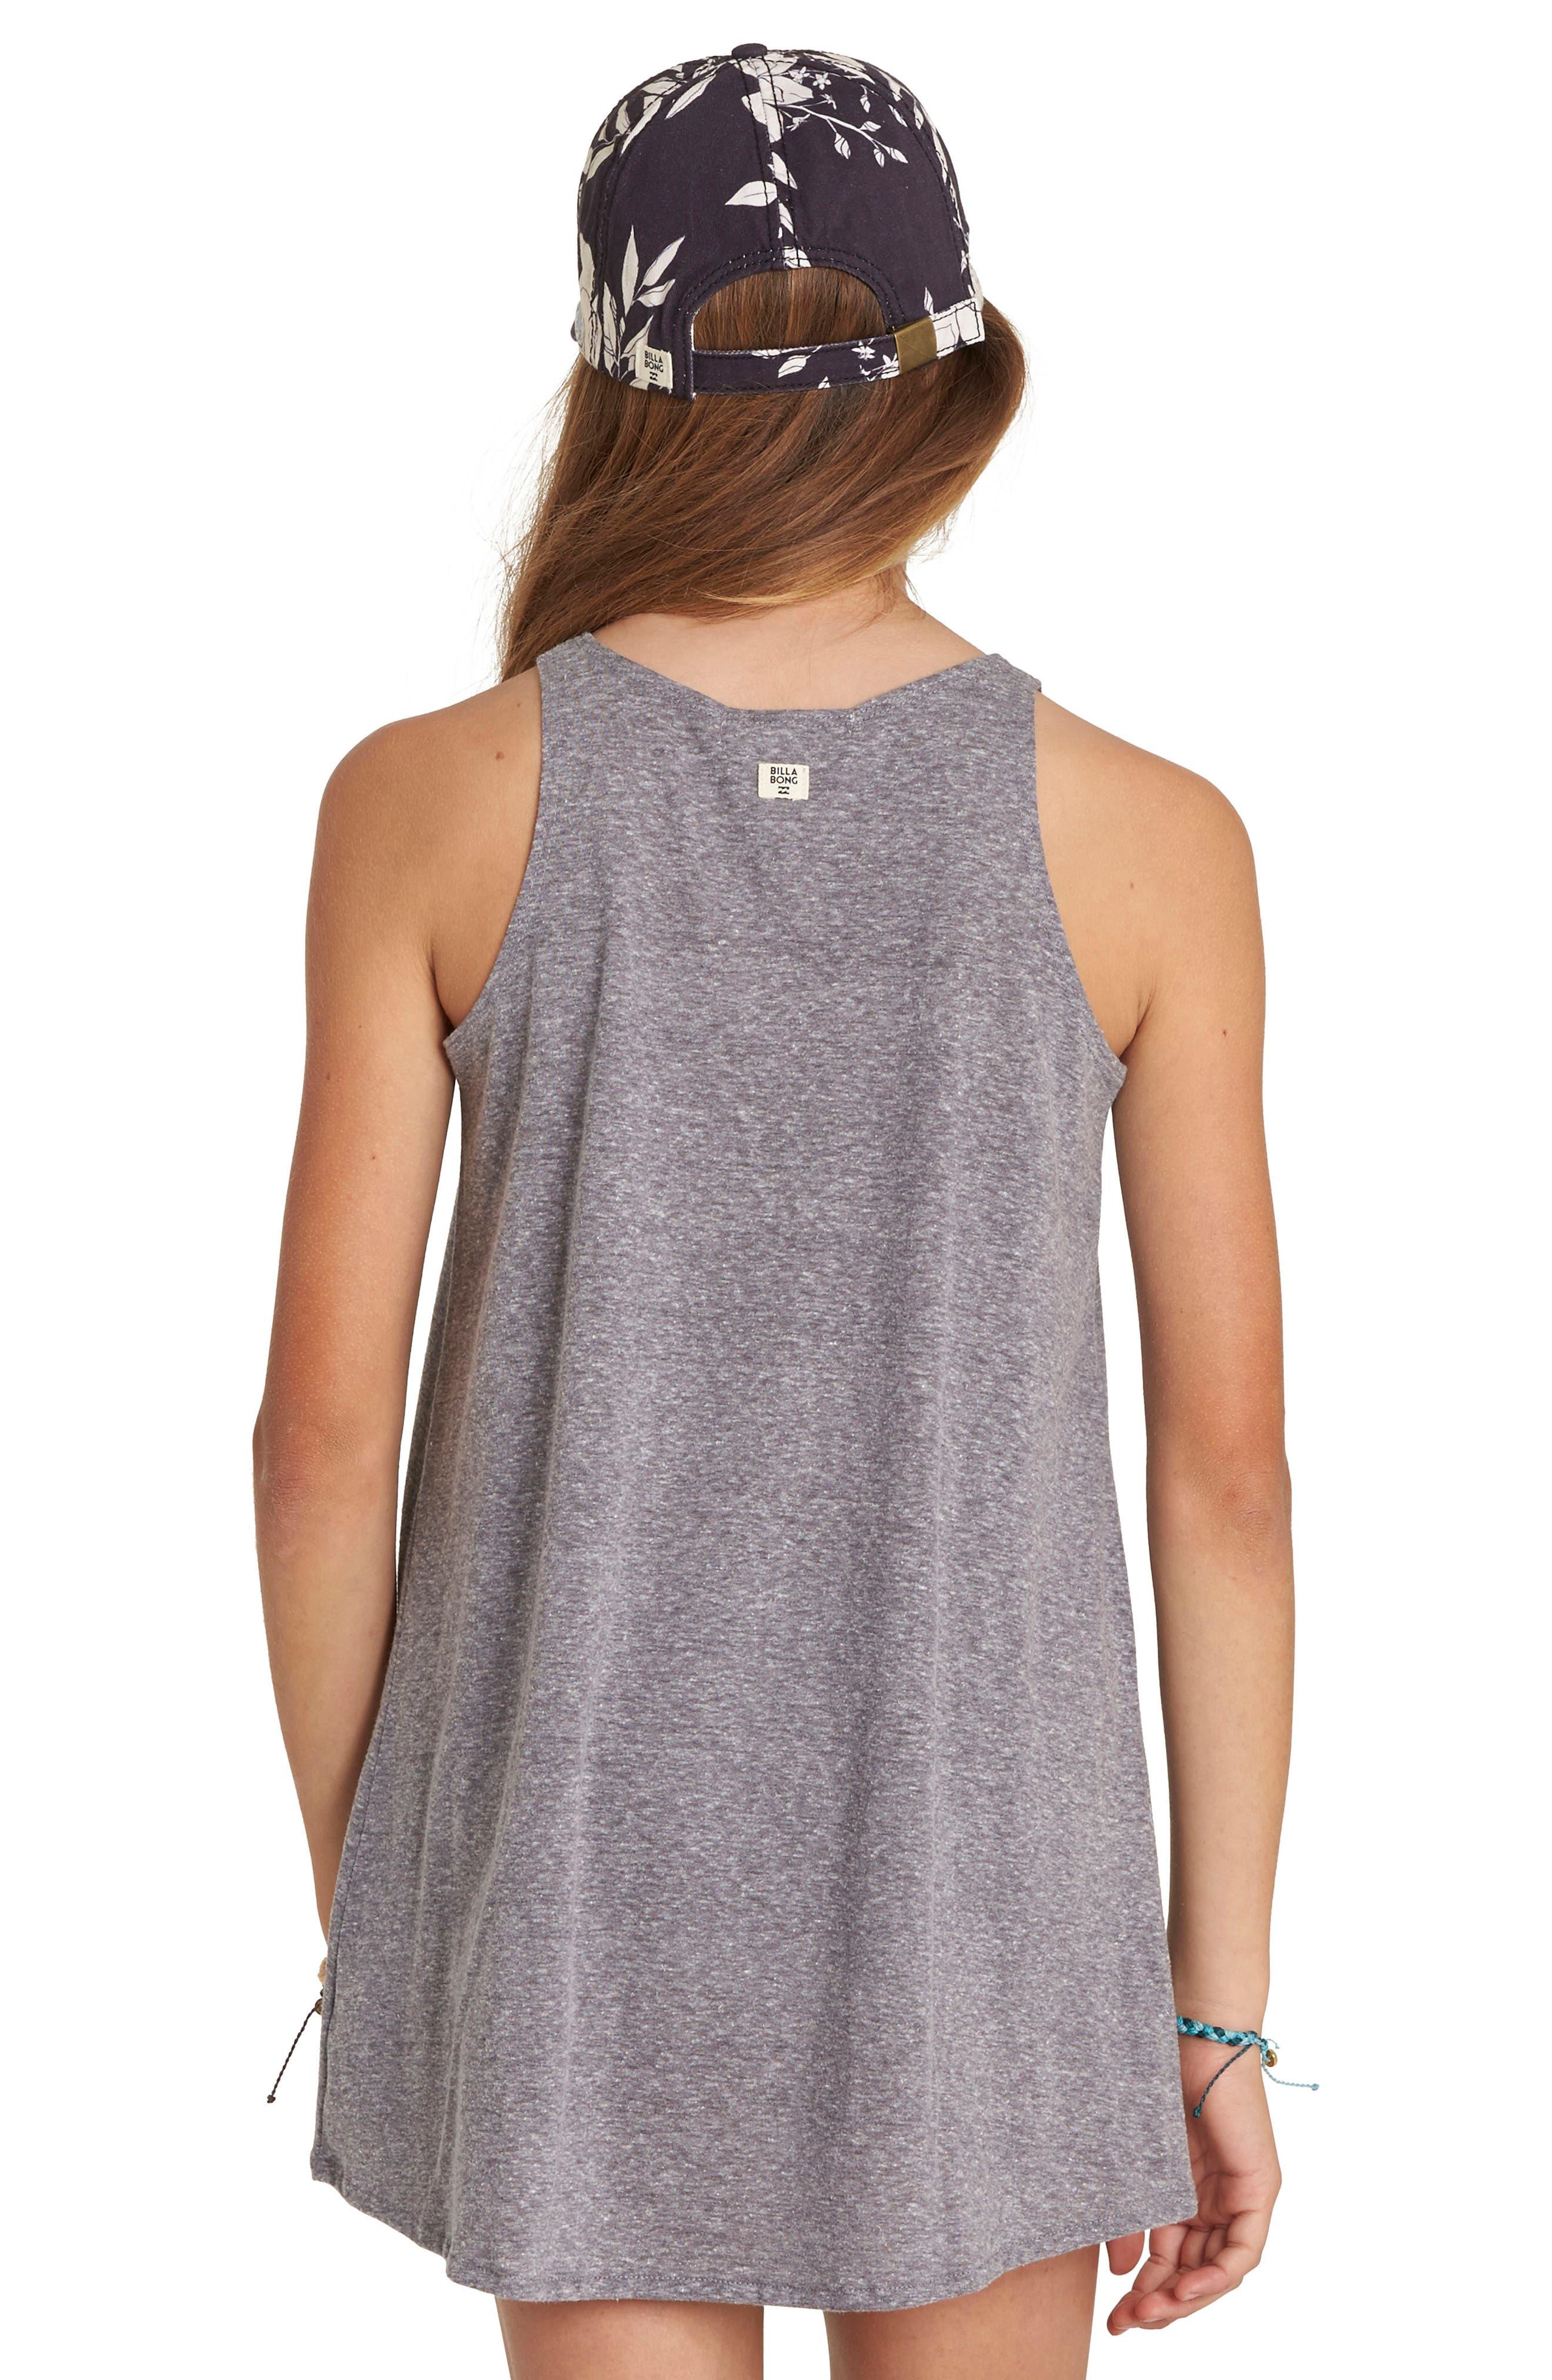 Choose You Graphic Tank Dress,                             Alternate thumbnail 2, color,                             Dark Athletic Grey